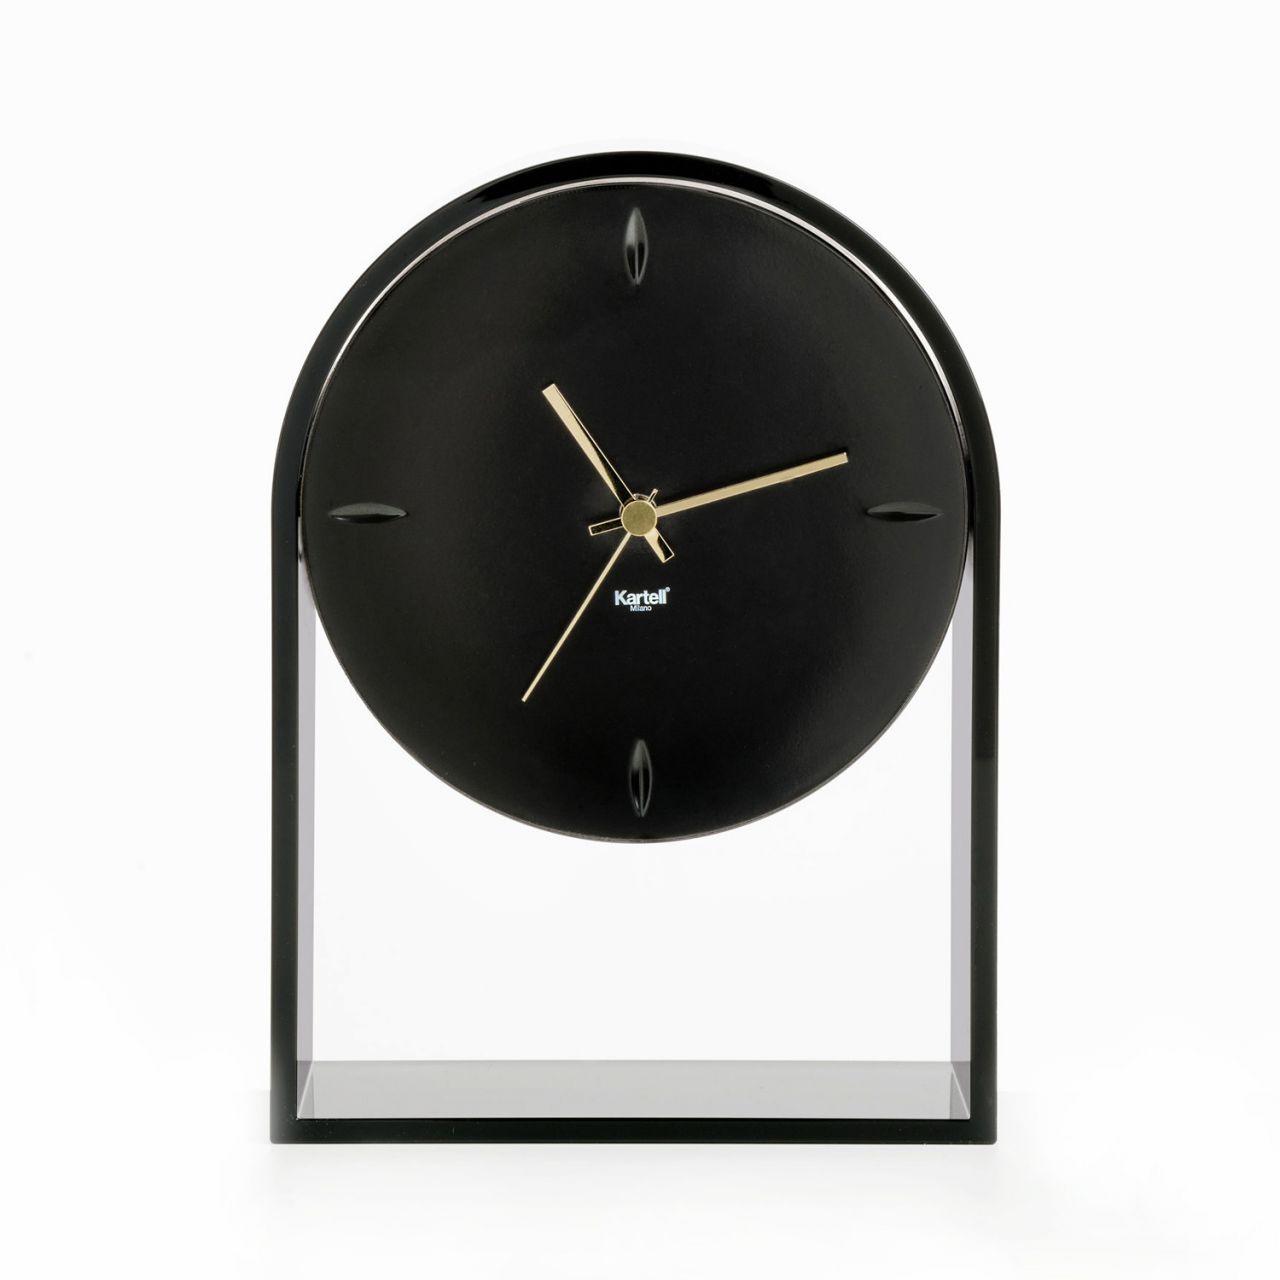 Kartell - Air du Temps Tischstanduhr 01930-09